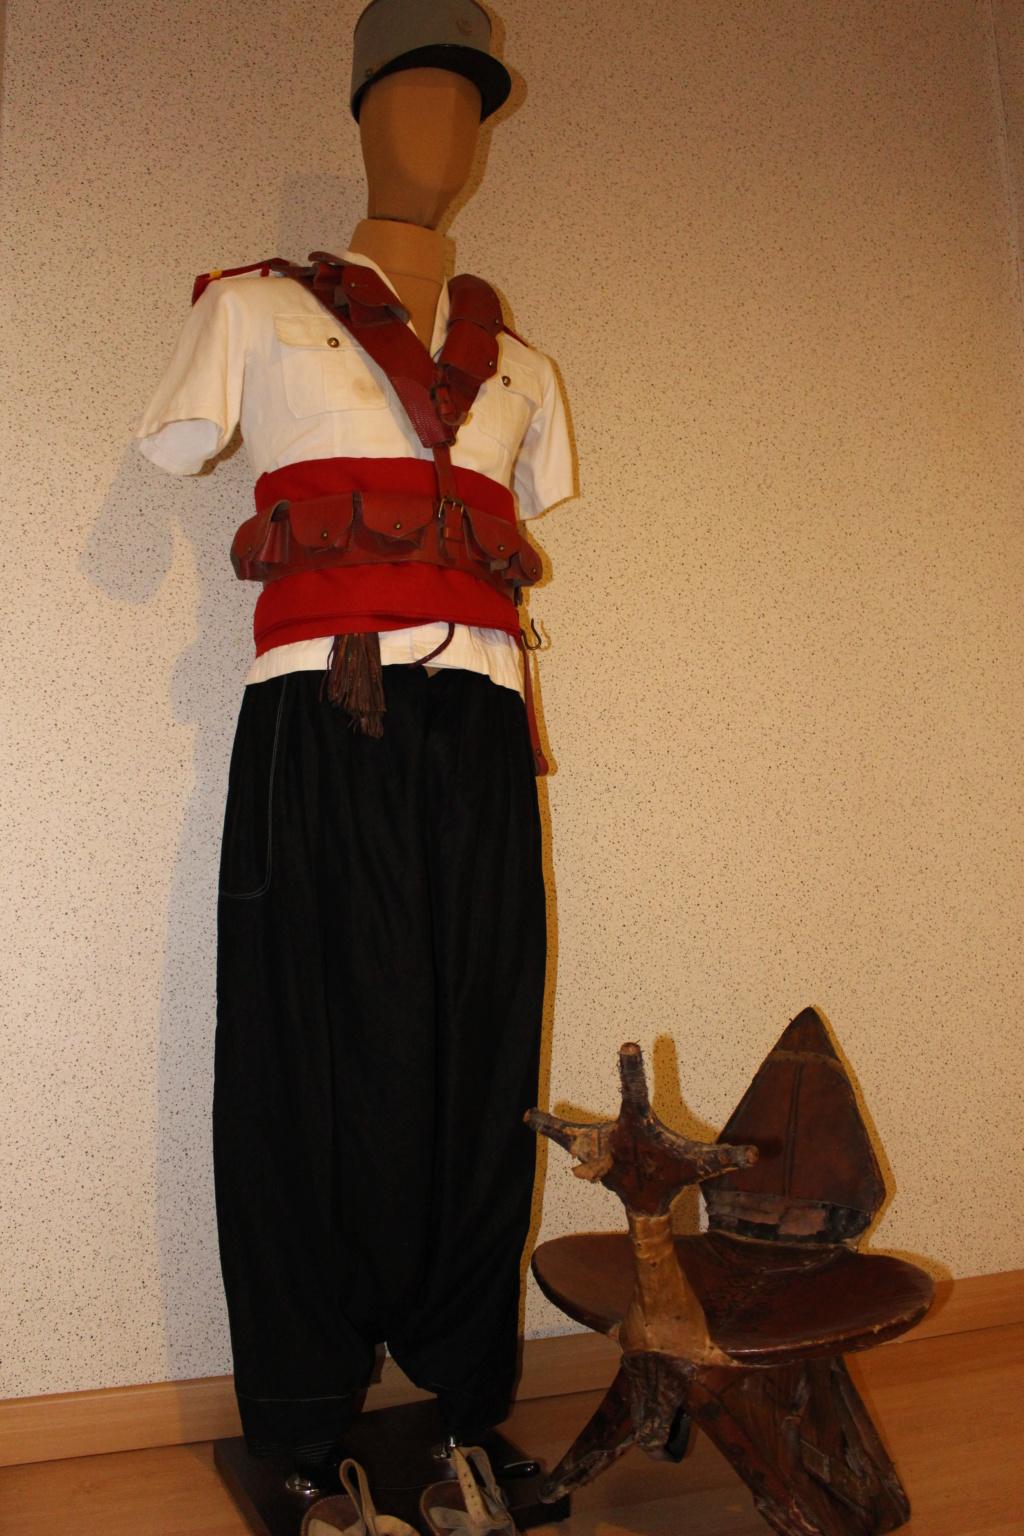 Mannequin méhariste, Compagnies sahariennes Img_2635